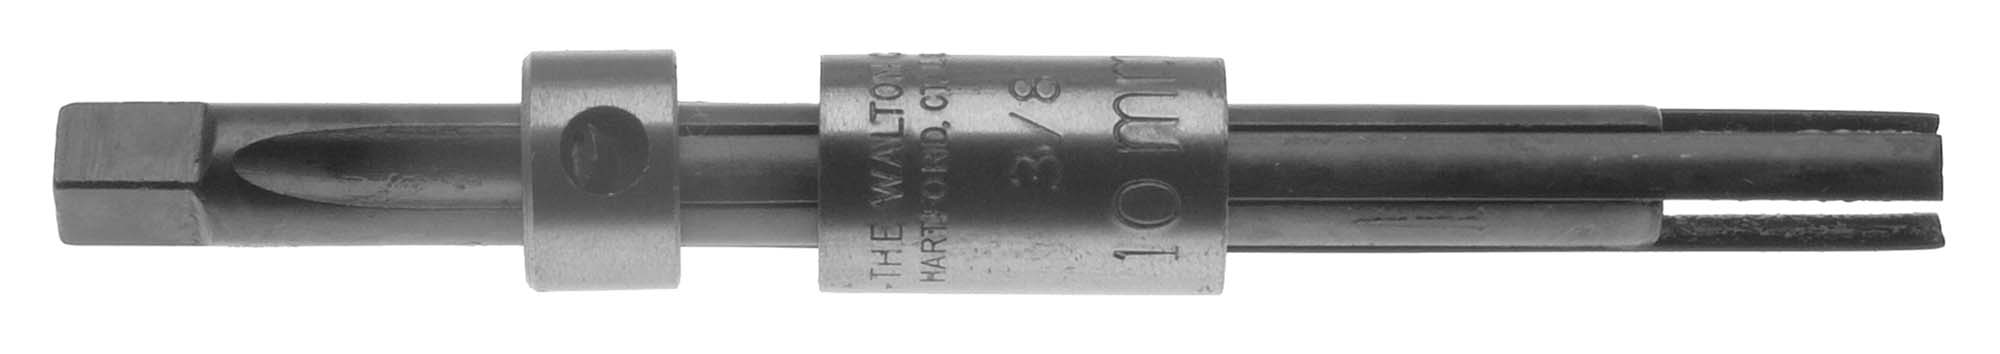 #5 3 Flute Walton Tap Extractor